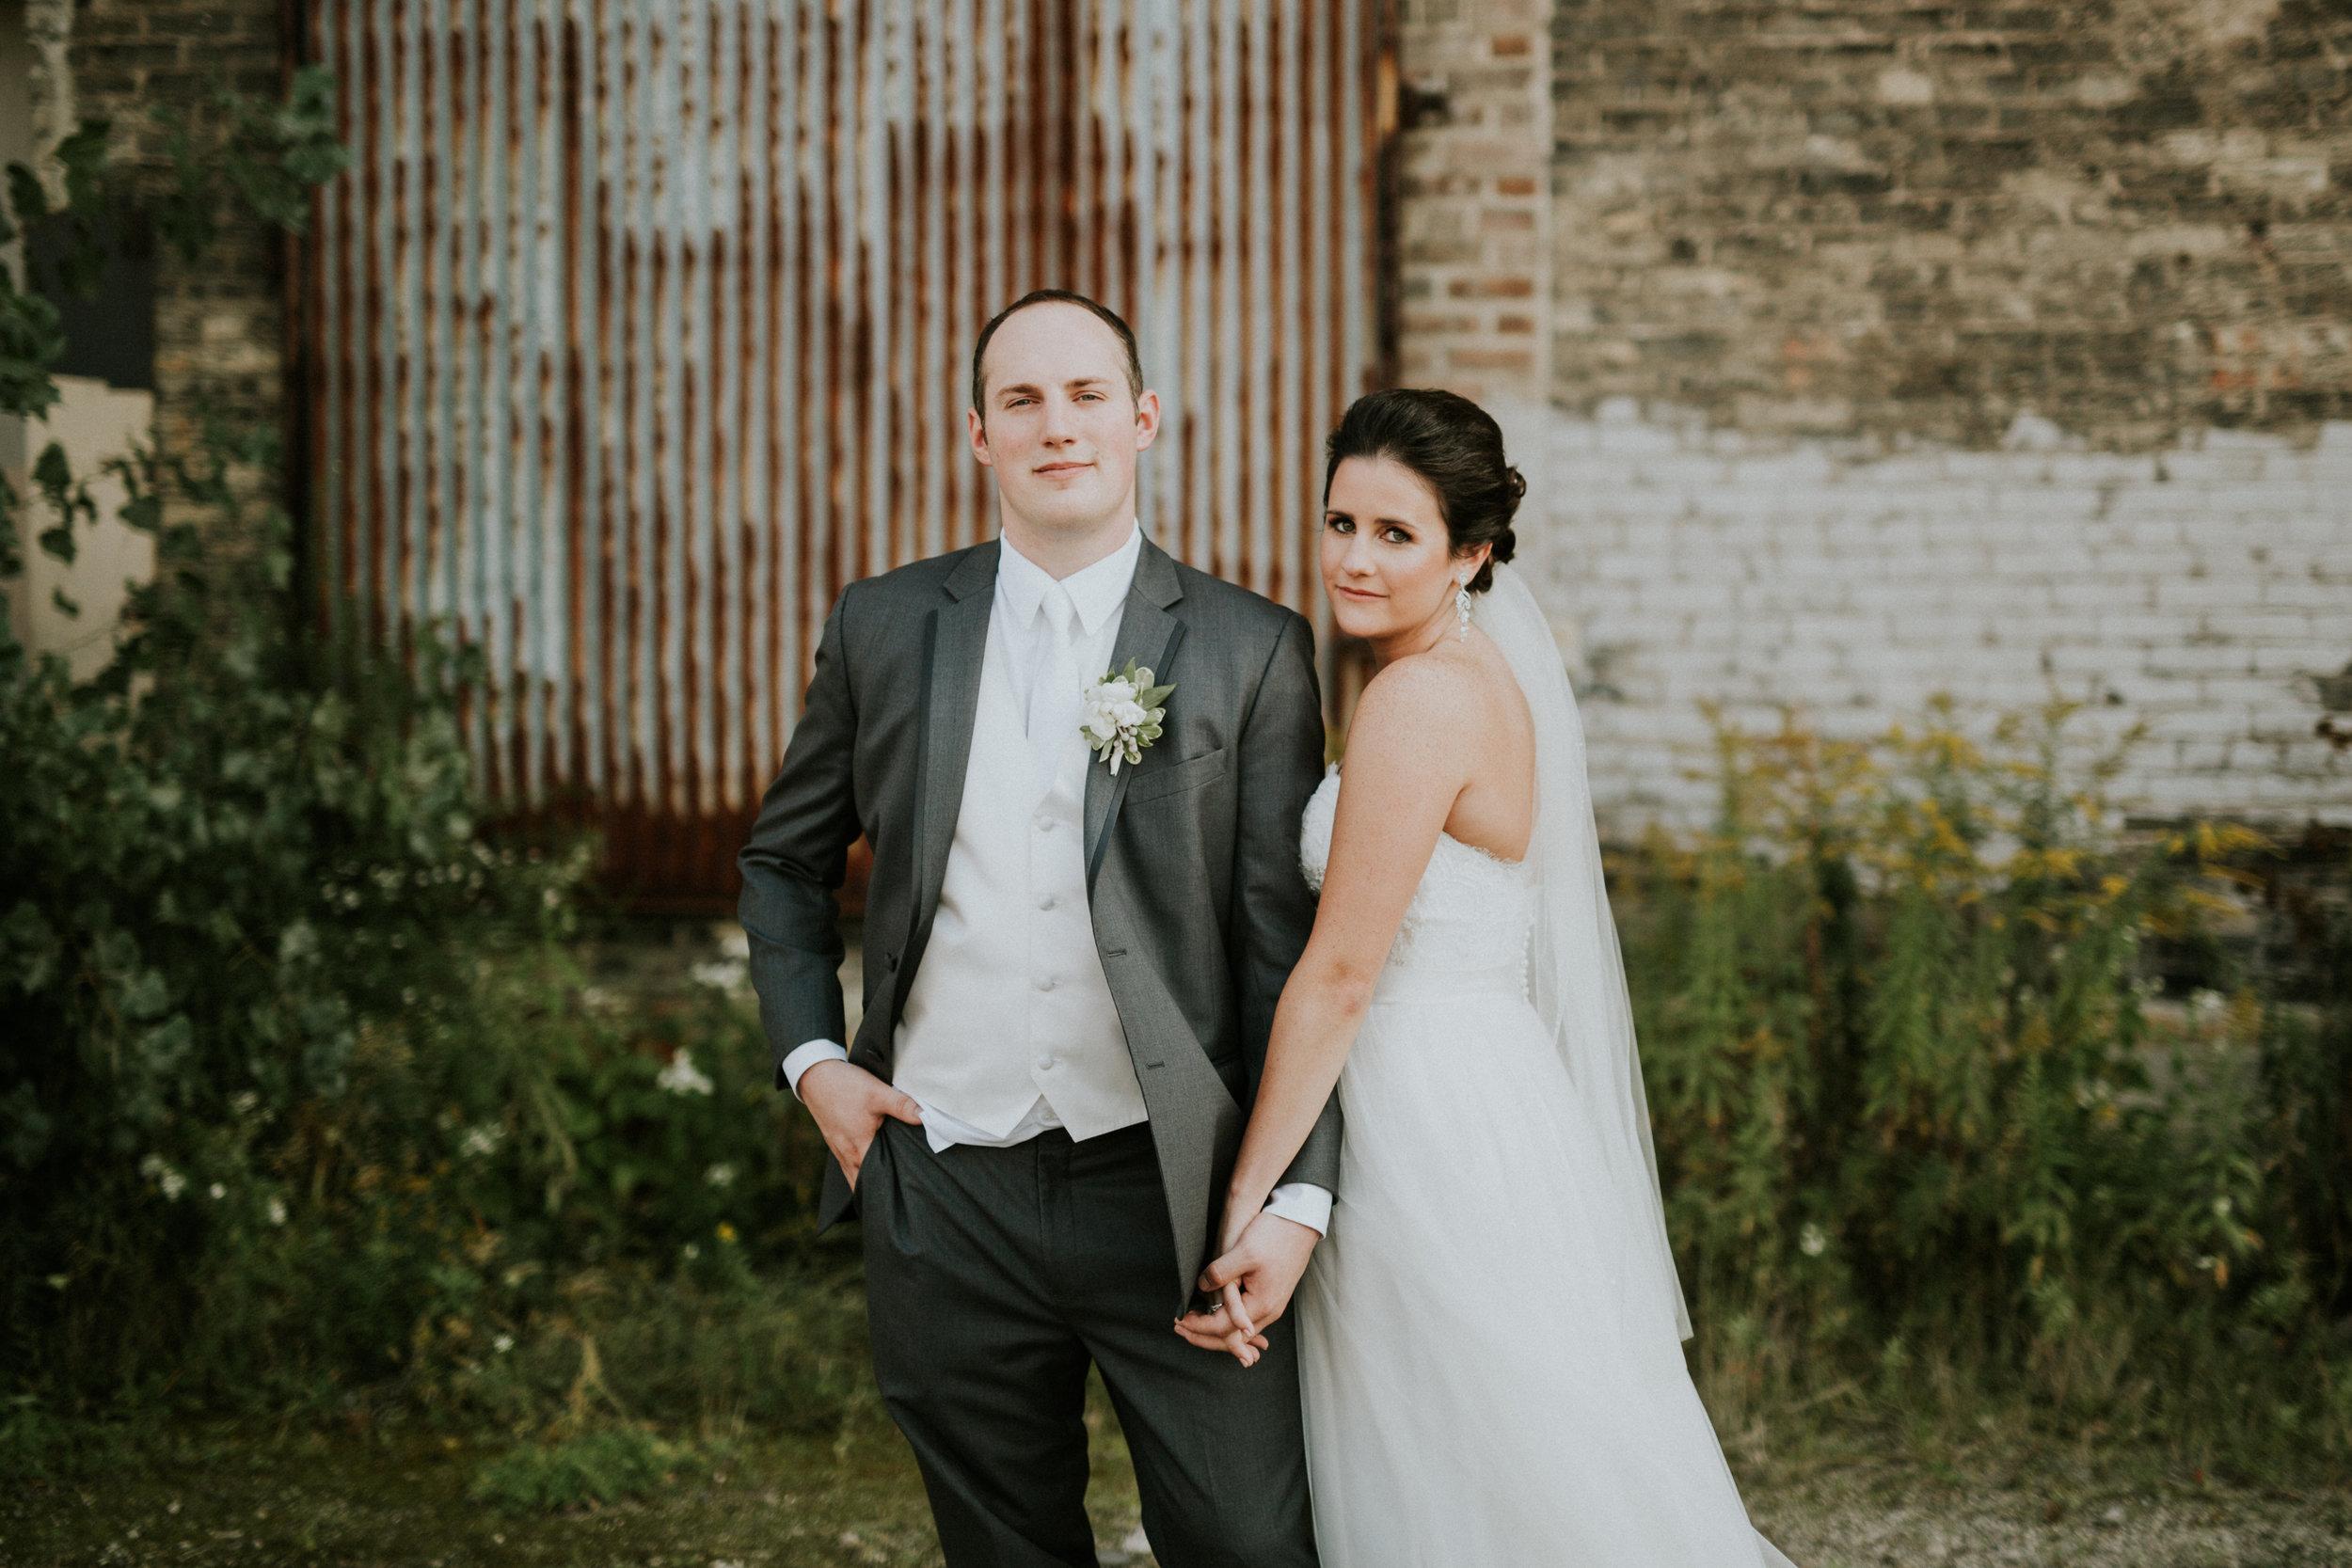 Patrick-Laura_Wedding-Day-490.jpg